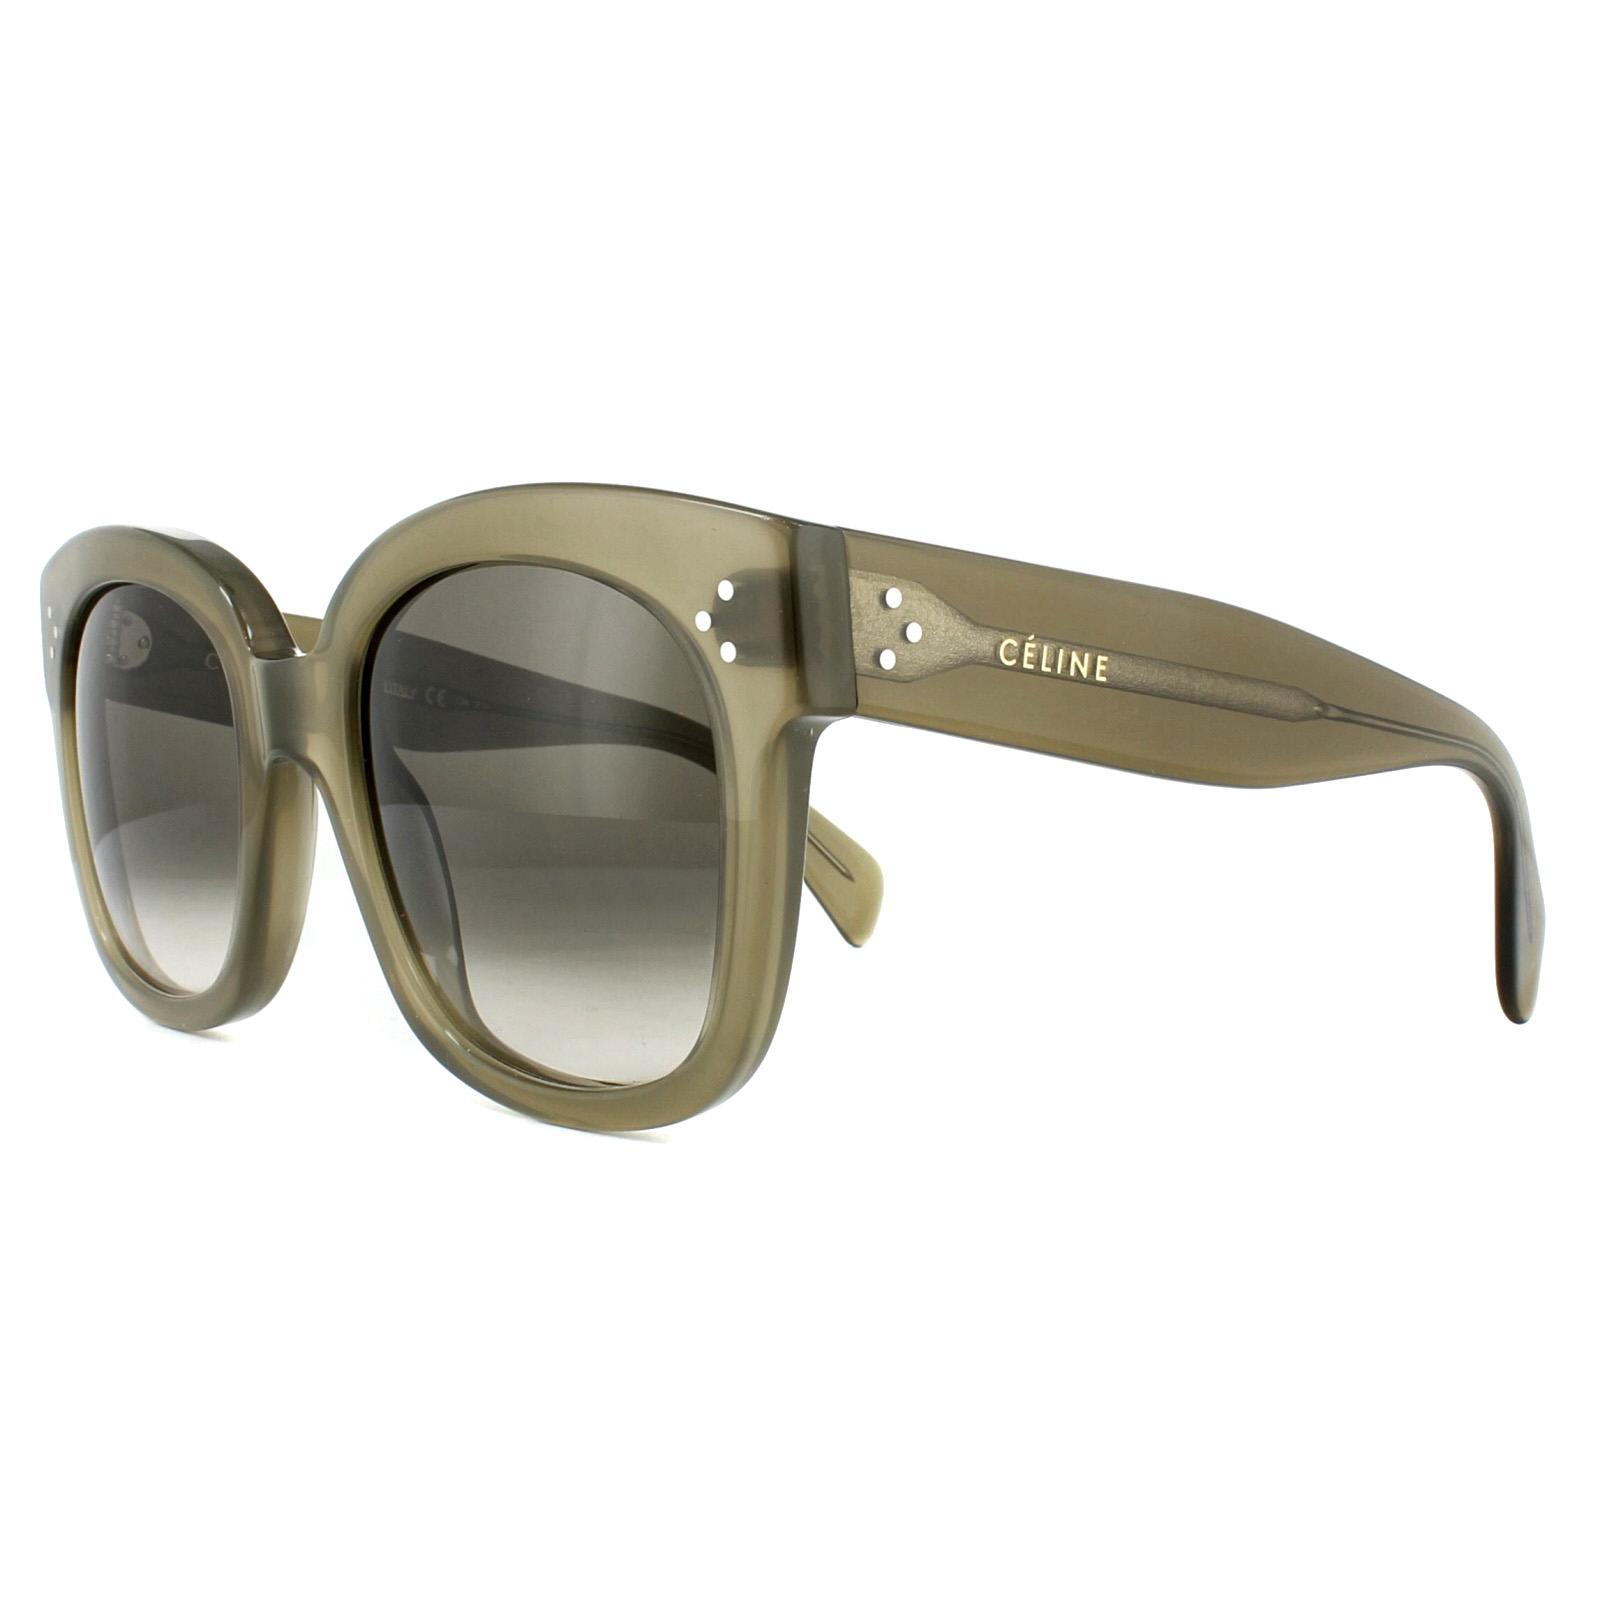 536b70e41478 Sentinel Celine Sunglasses 41805S New Audrey QP4 Z3 Military Green Brown  Gradient